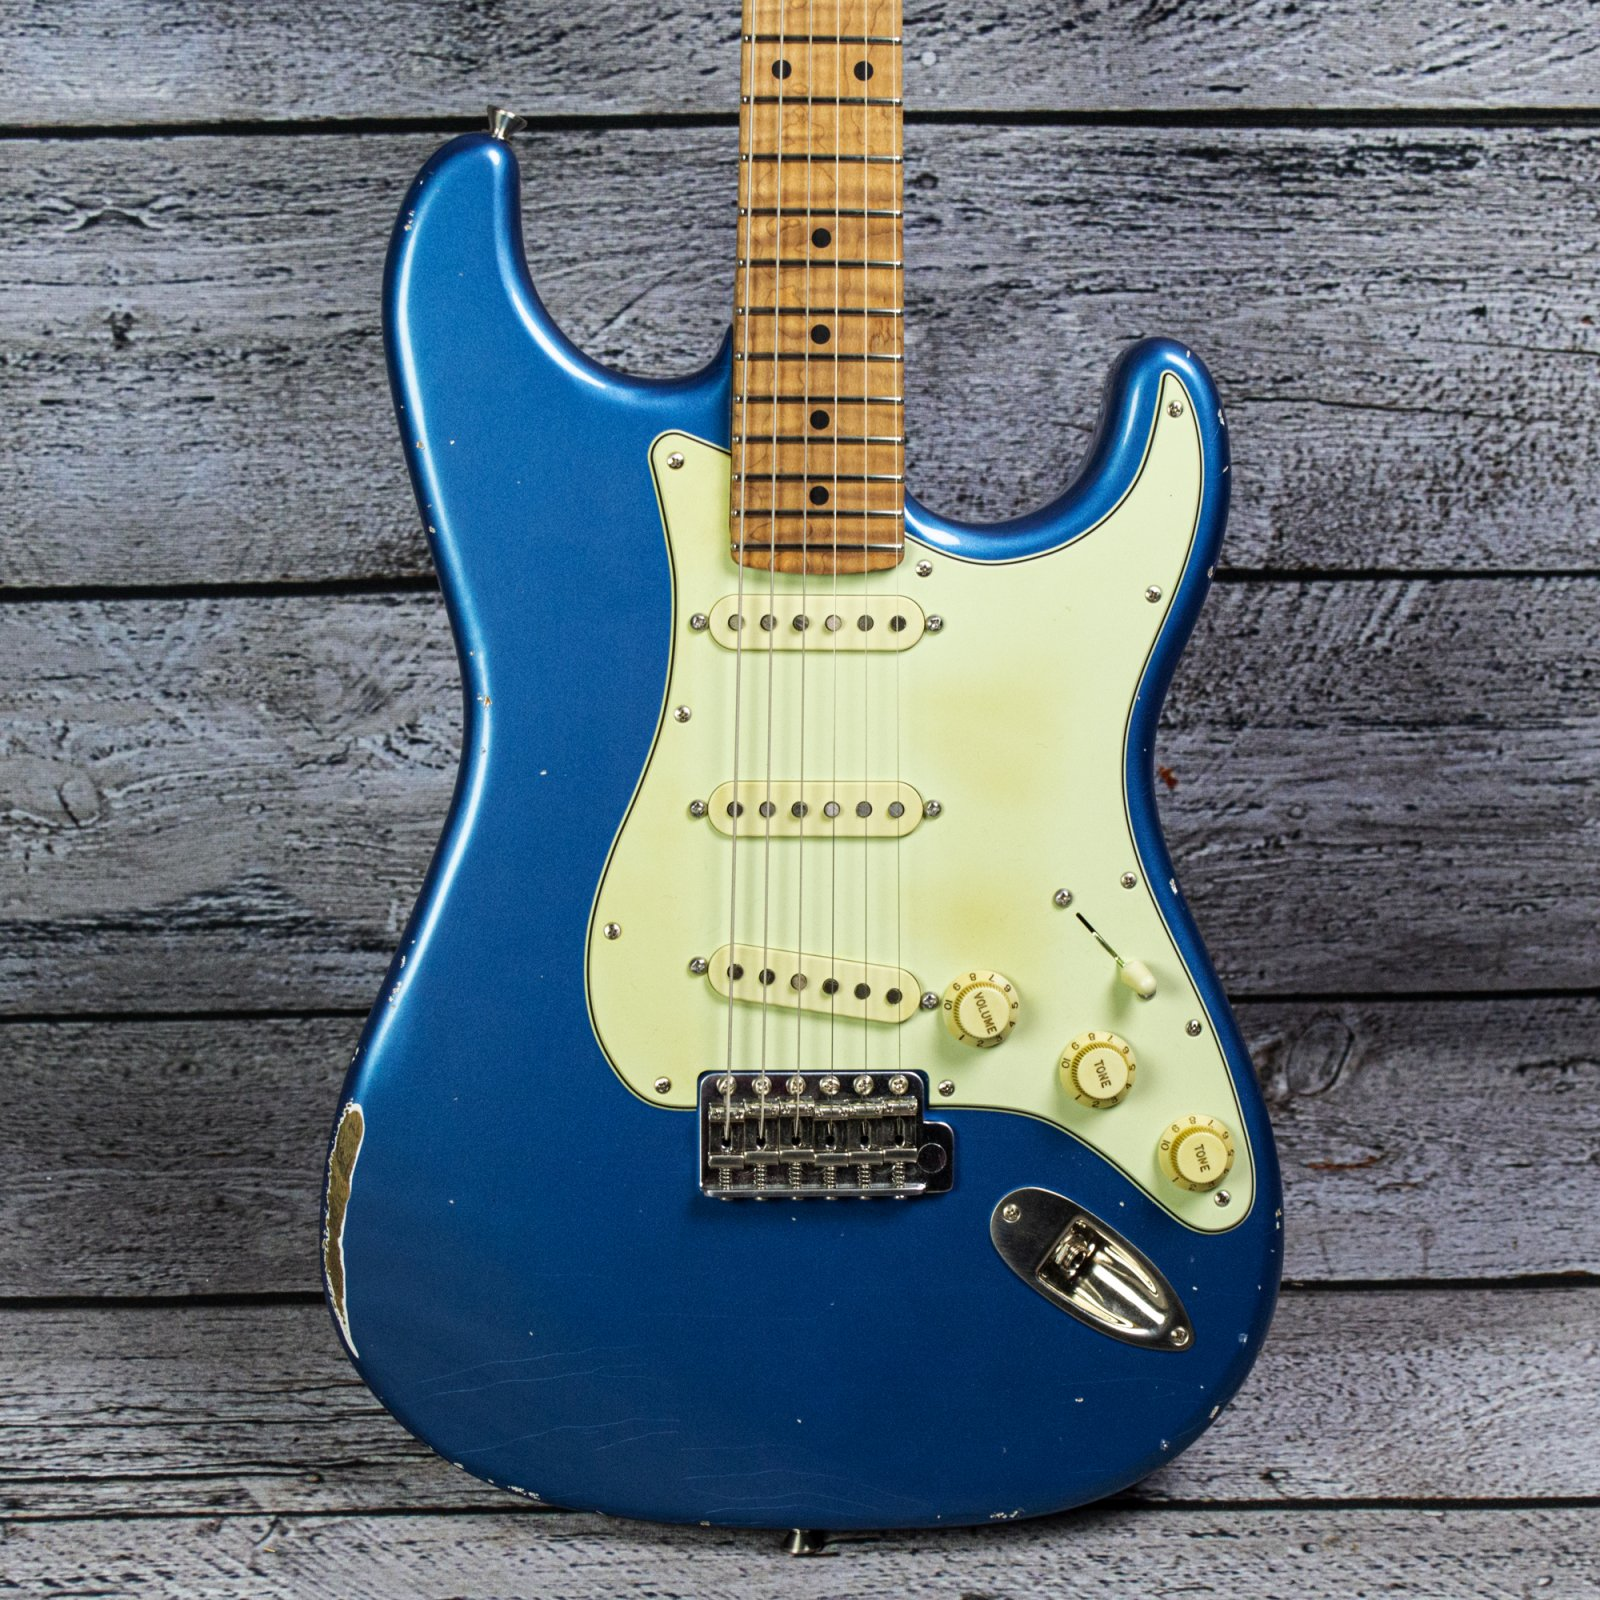 Xotic Guitars XSC-1 - Medium Aged Lake Placid Blue